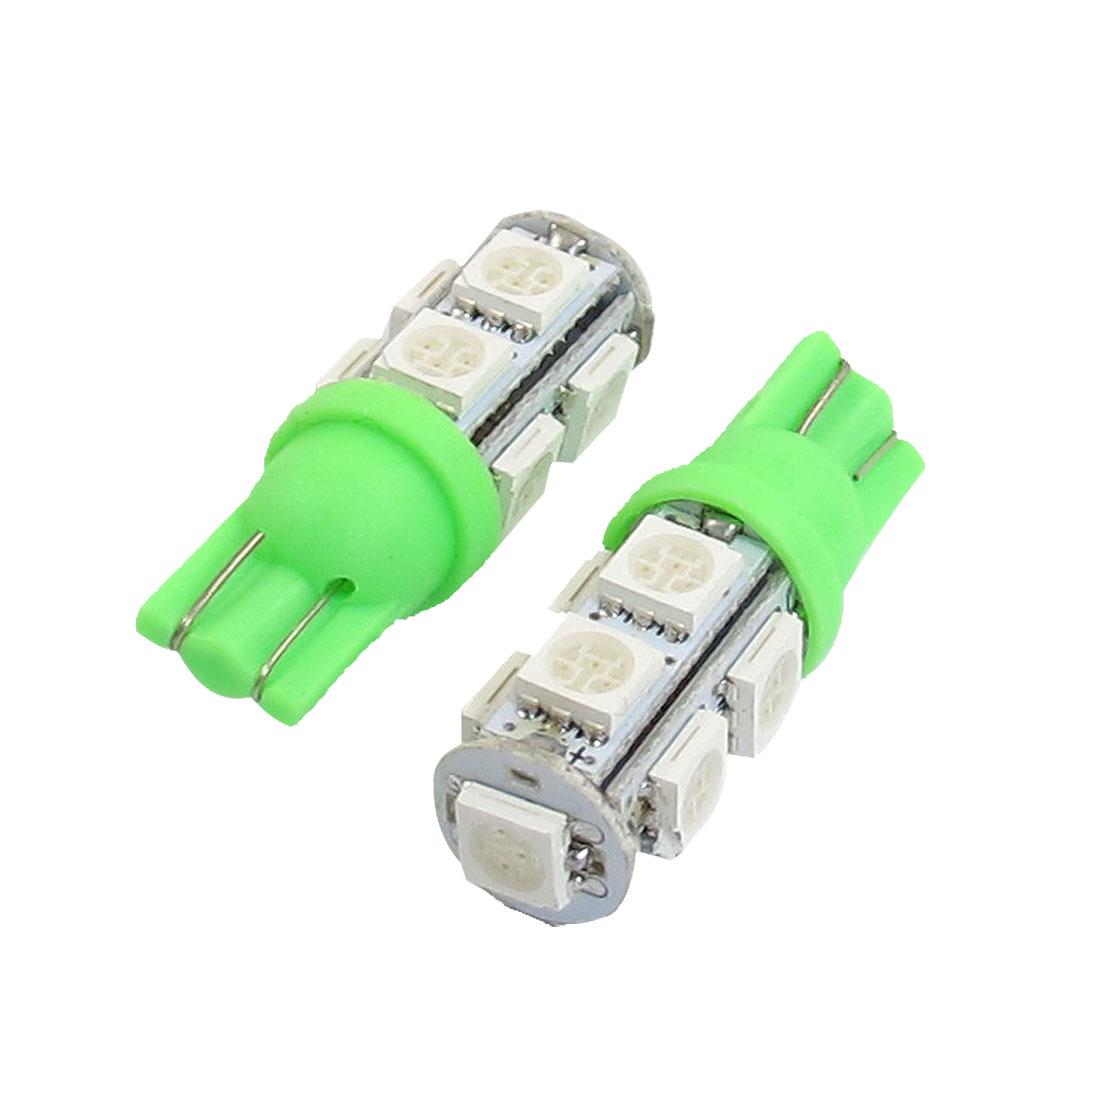 Vehicle-T10-Green-5050-SMD-9-LED-Brake-Side-Light-Bulbs-12VDC-2pcs